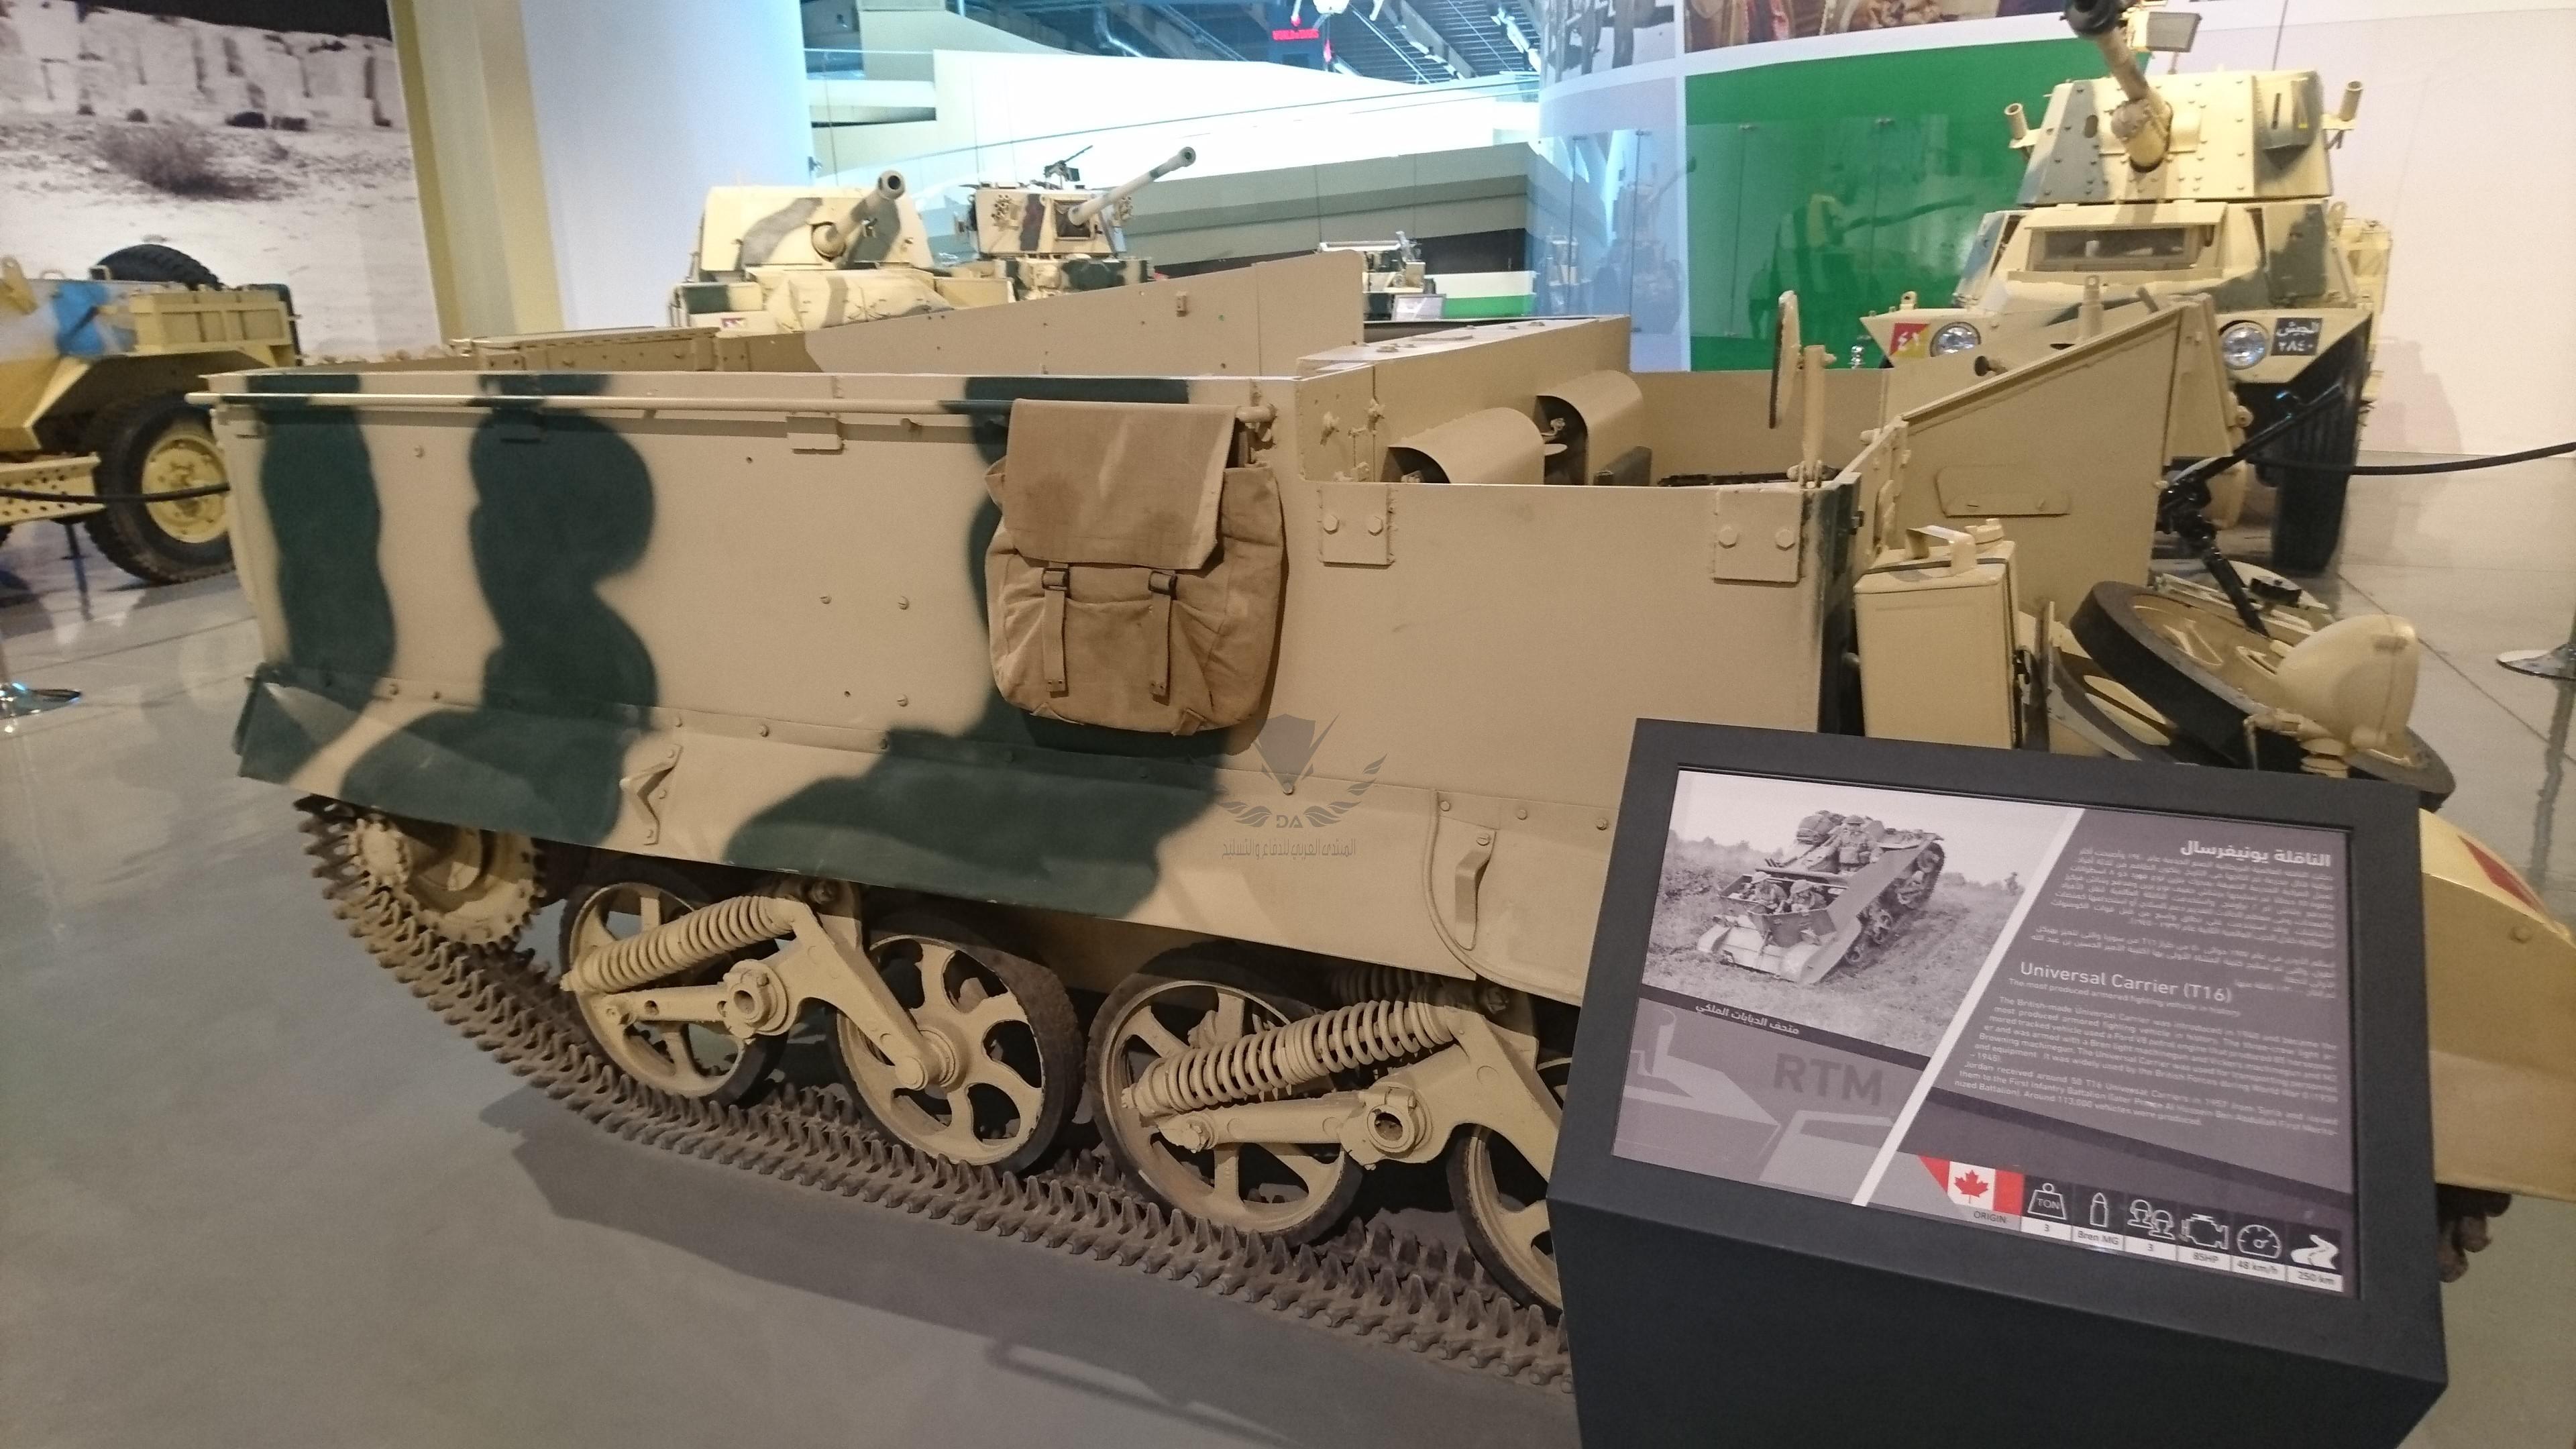 Royal_Tank_Museum_43.jpg